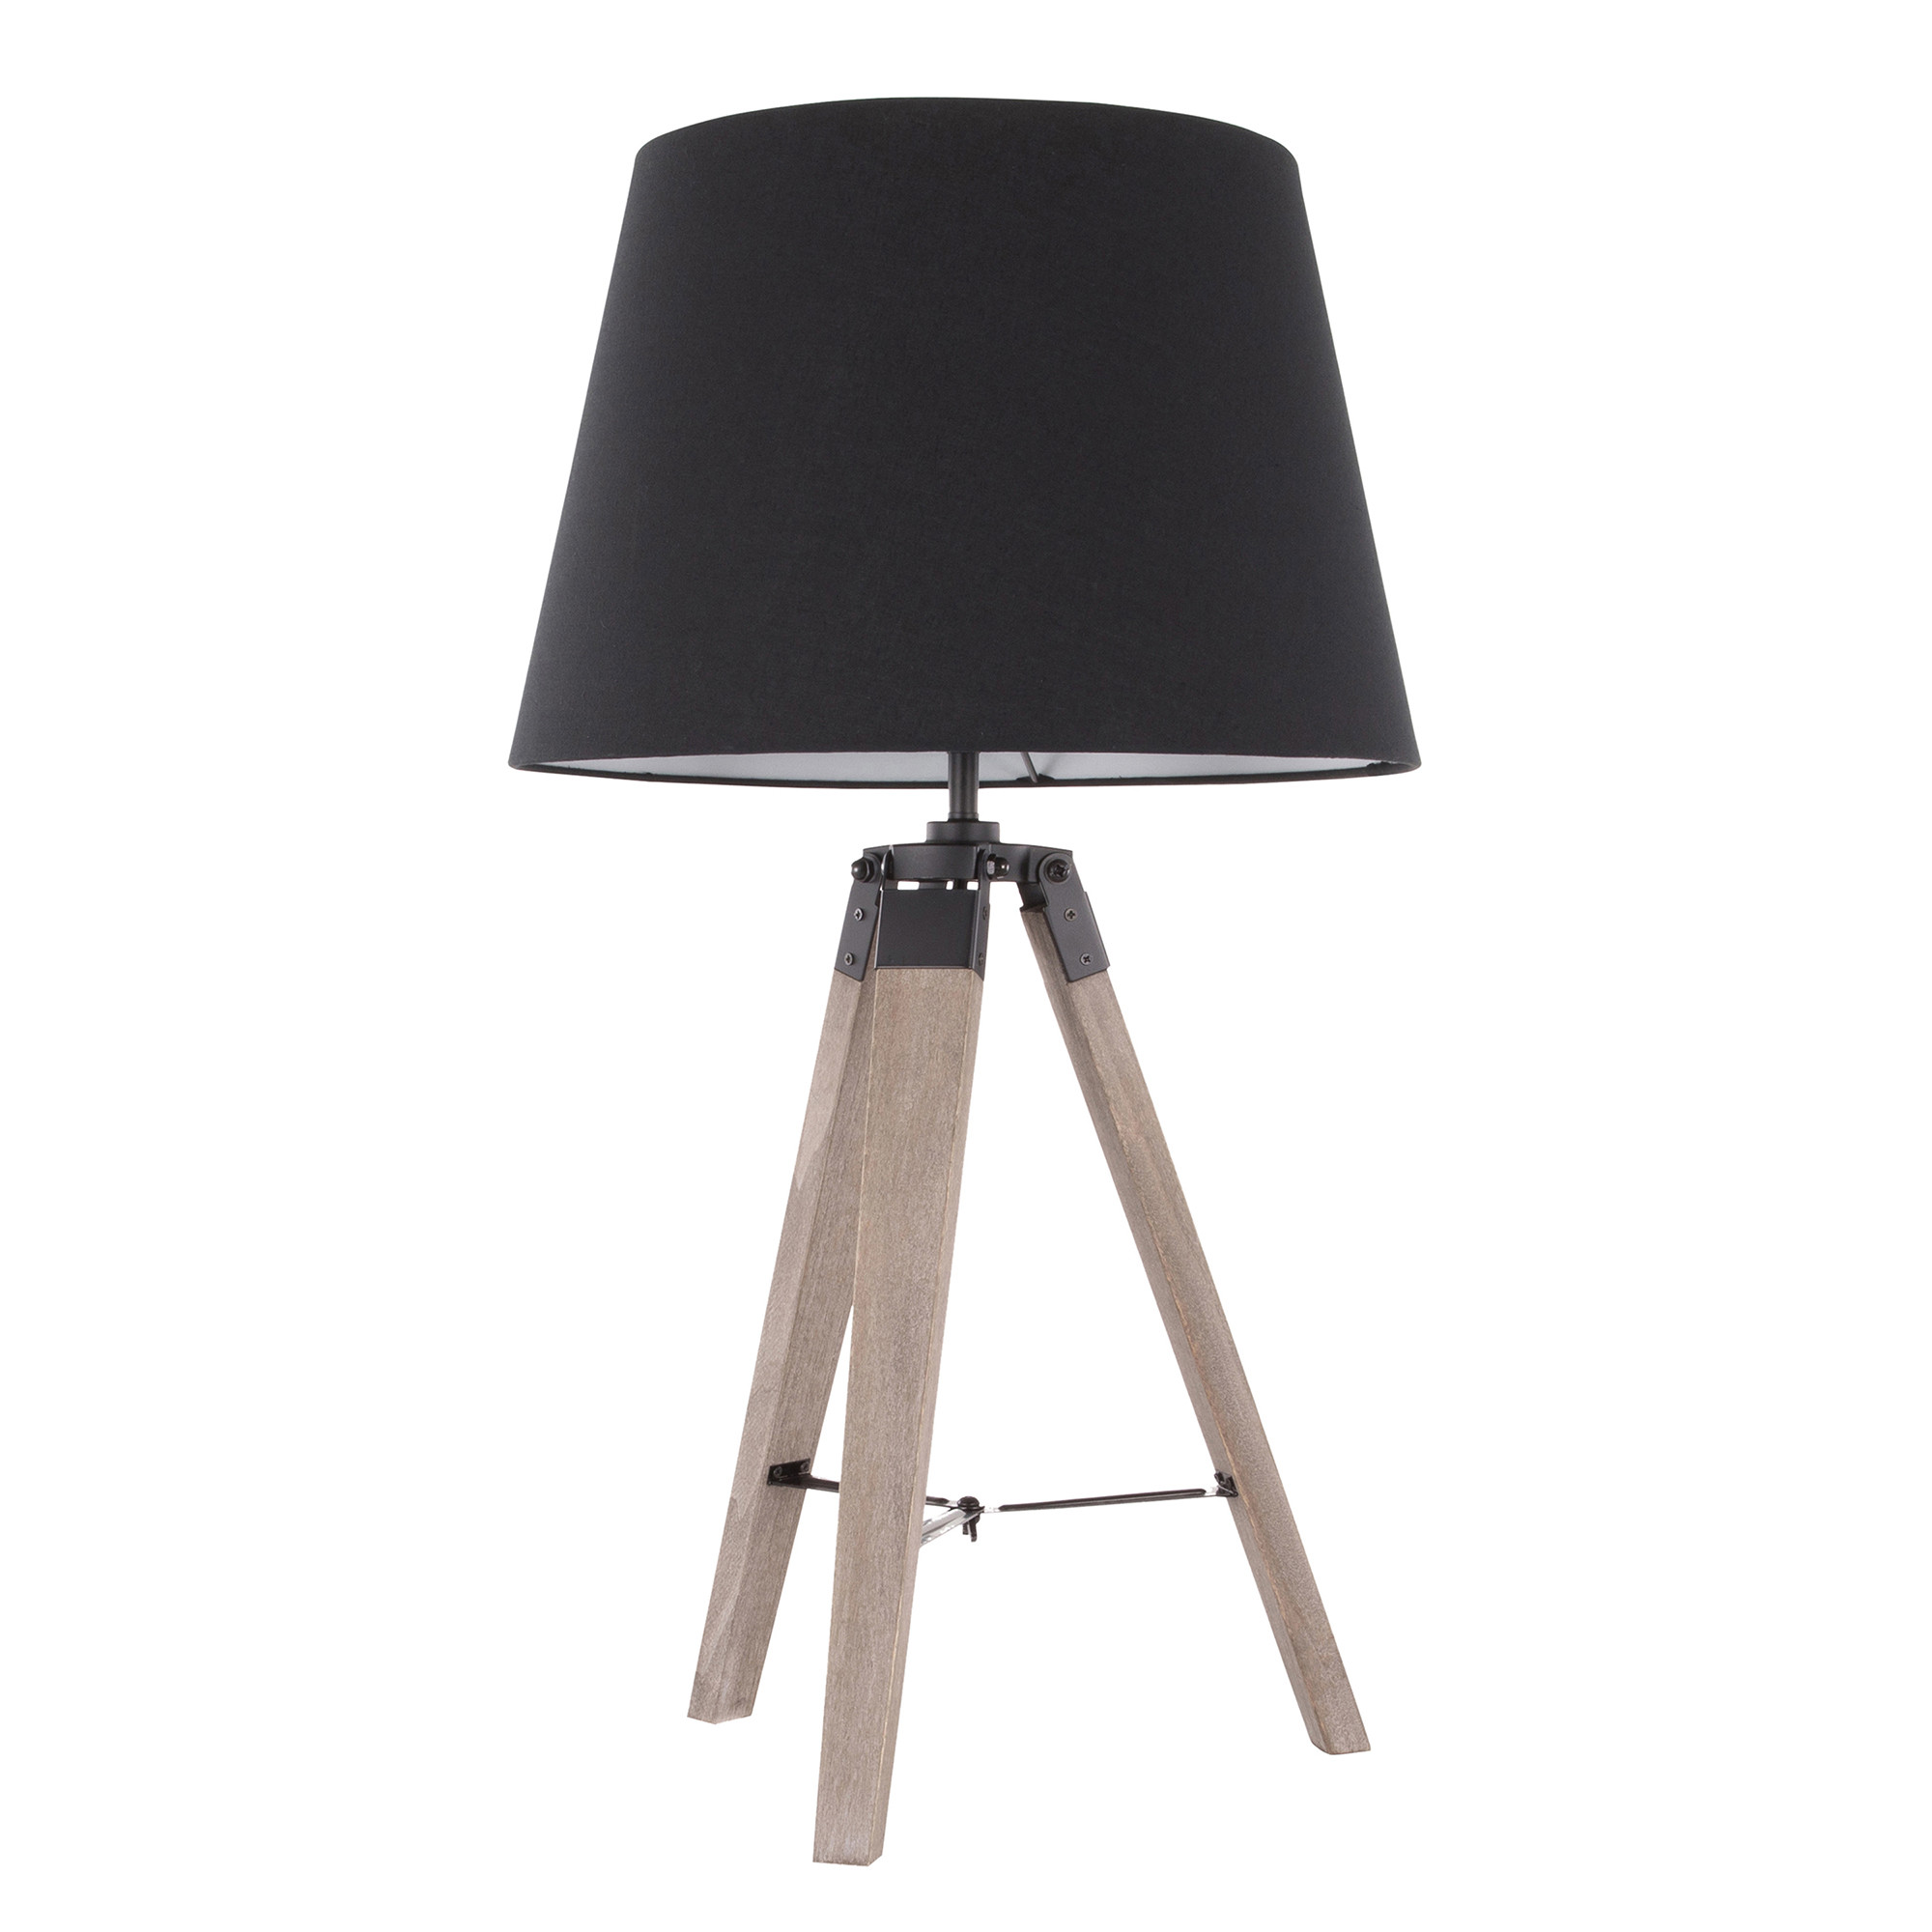 Compass   Modern   Shade   Table   Black   Wood   Lamp   Grey